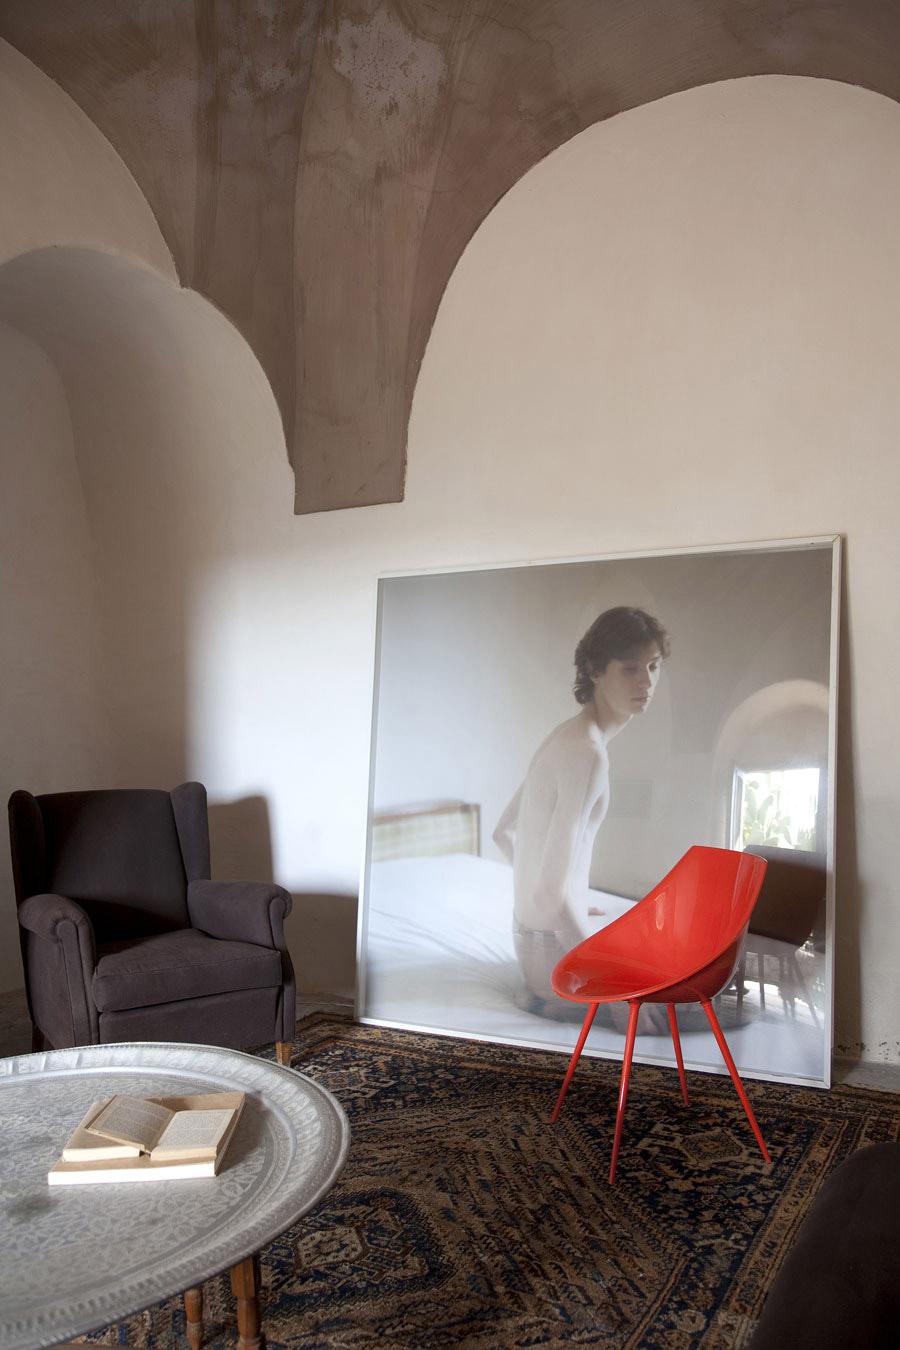 Art, Casa Albanese, Island of Pantelleria, Italy by ASA Studio Albanese